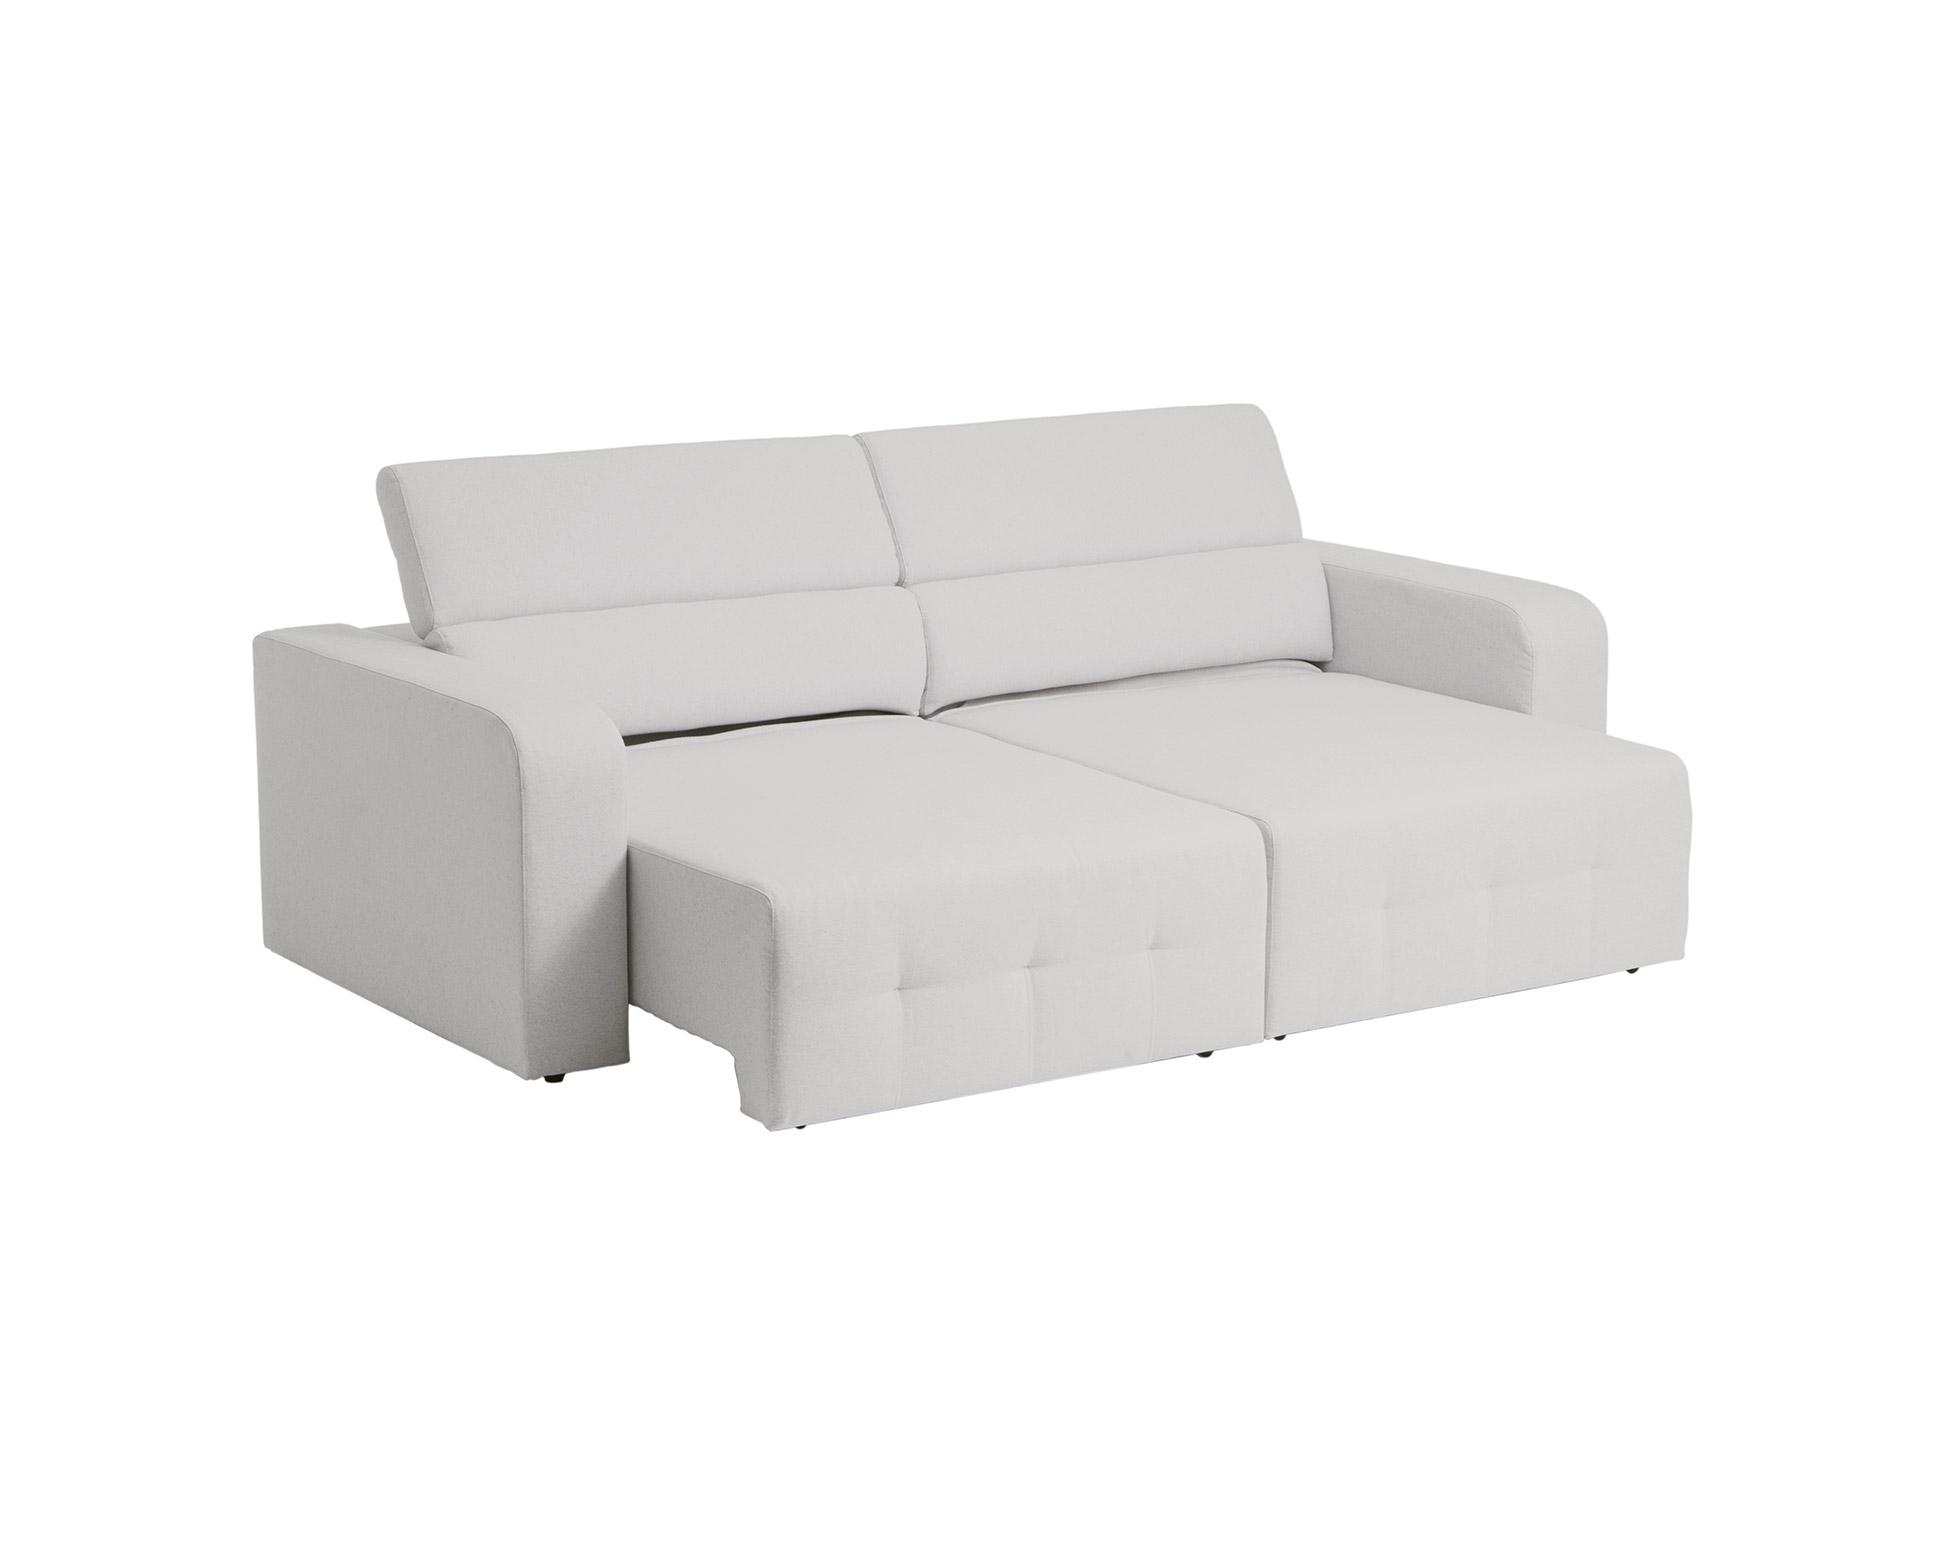 sofa-retratil-gavea-2,30m-b2025